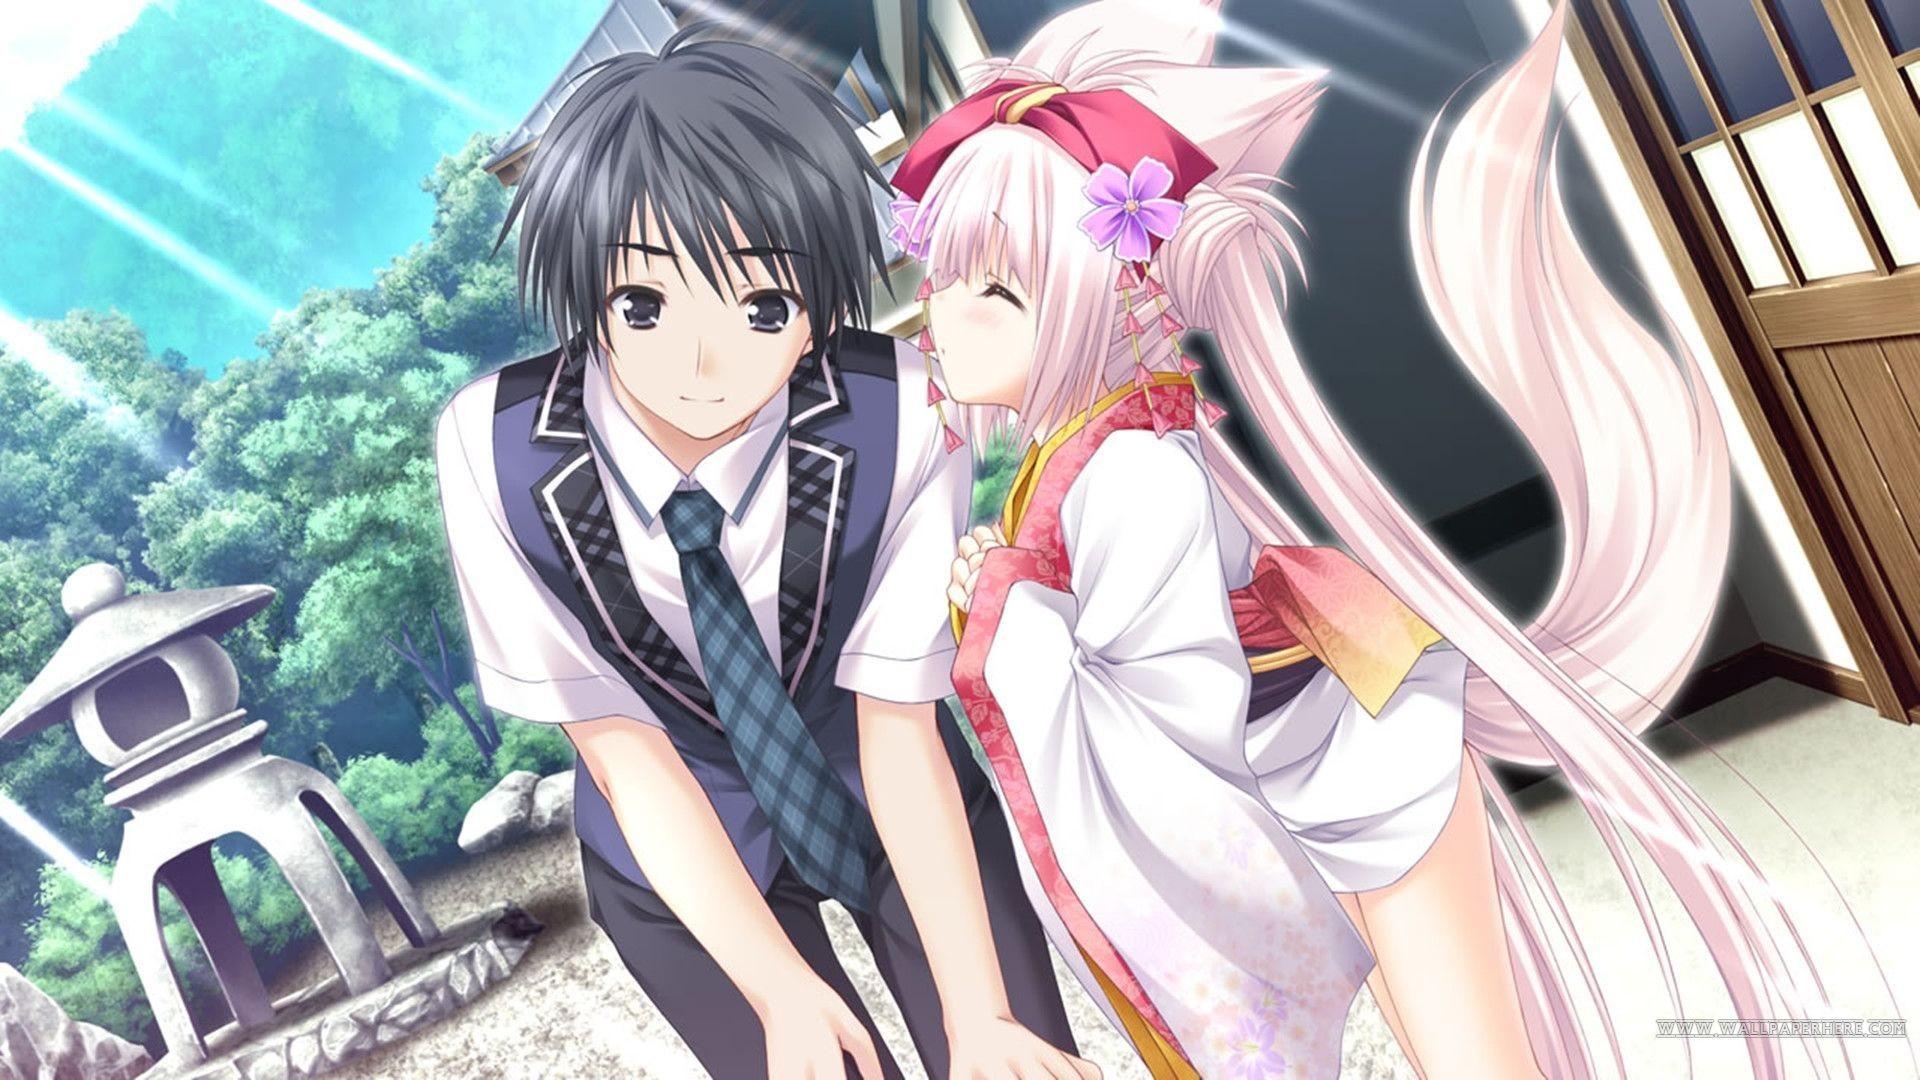 Cute Anime Couple Wallpaper Hd – Anime Wallpaper